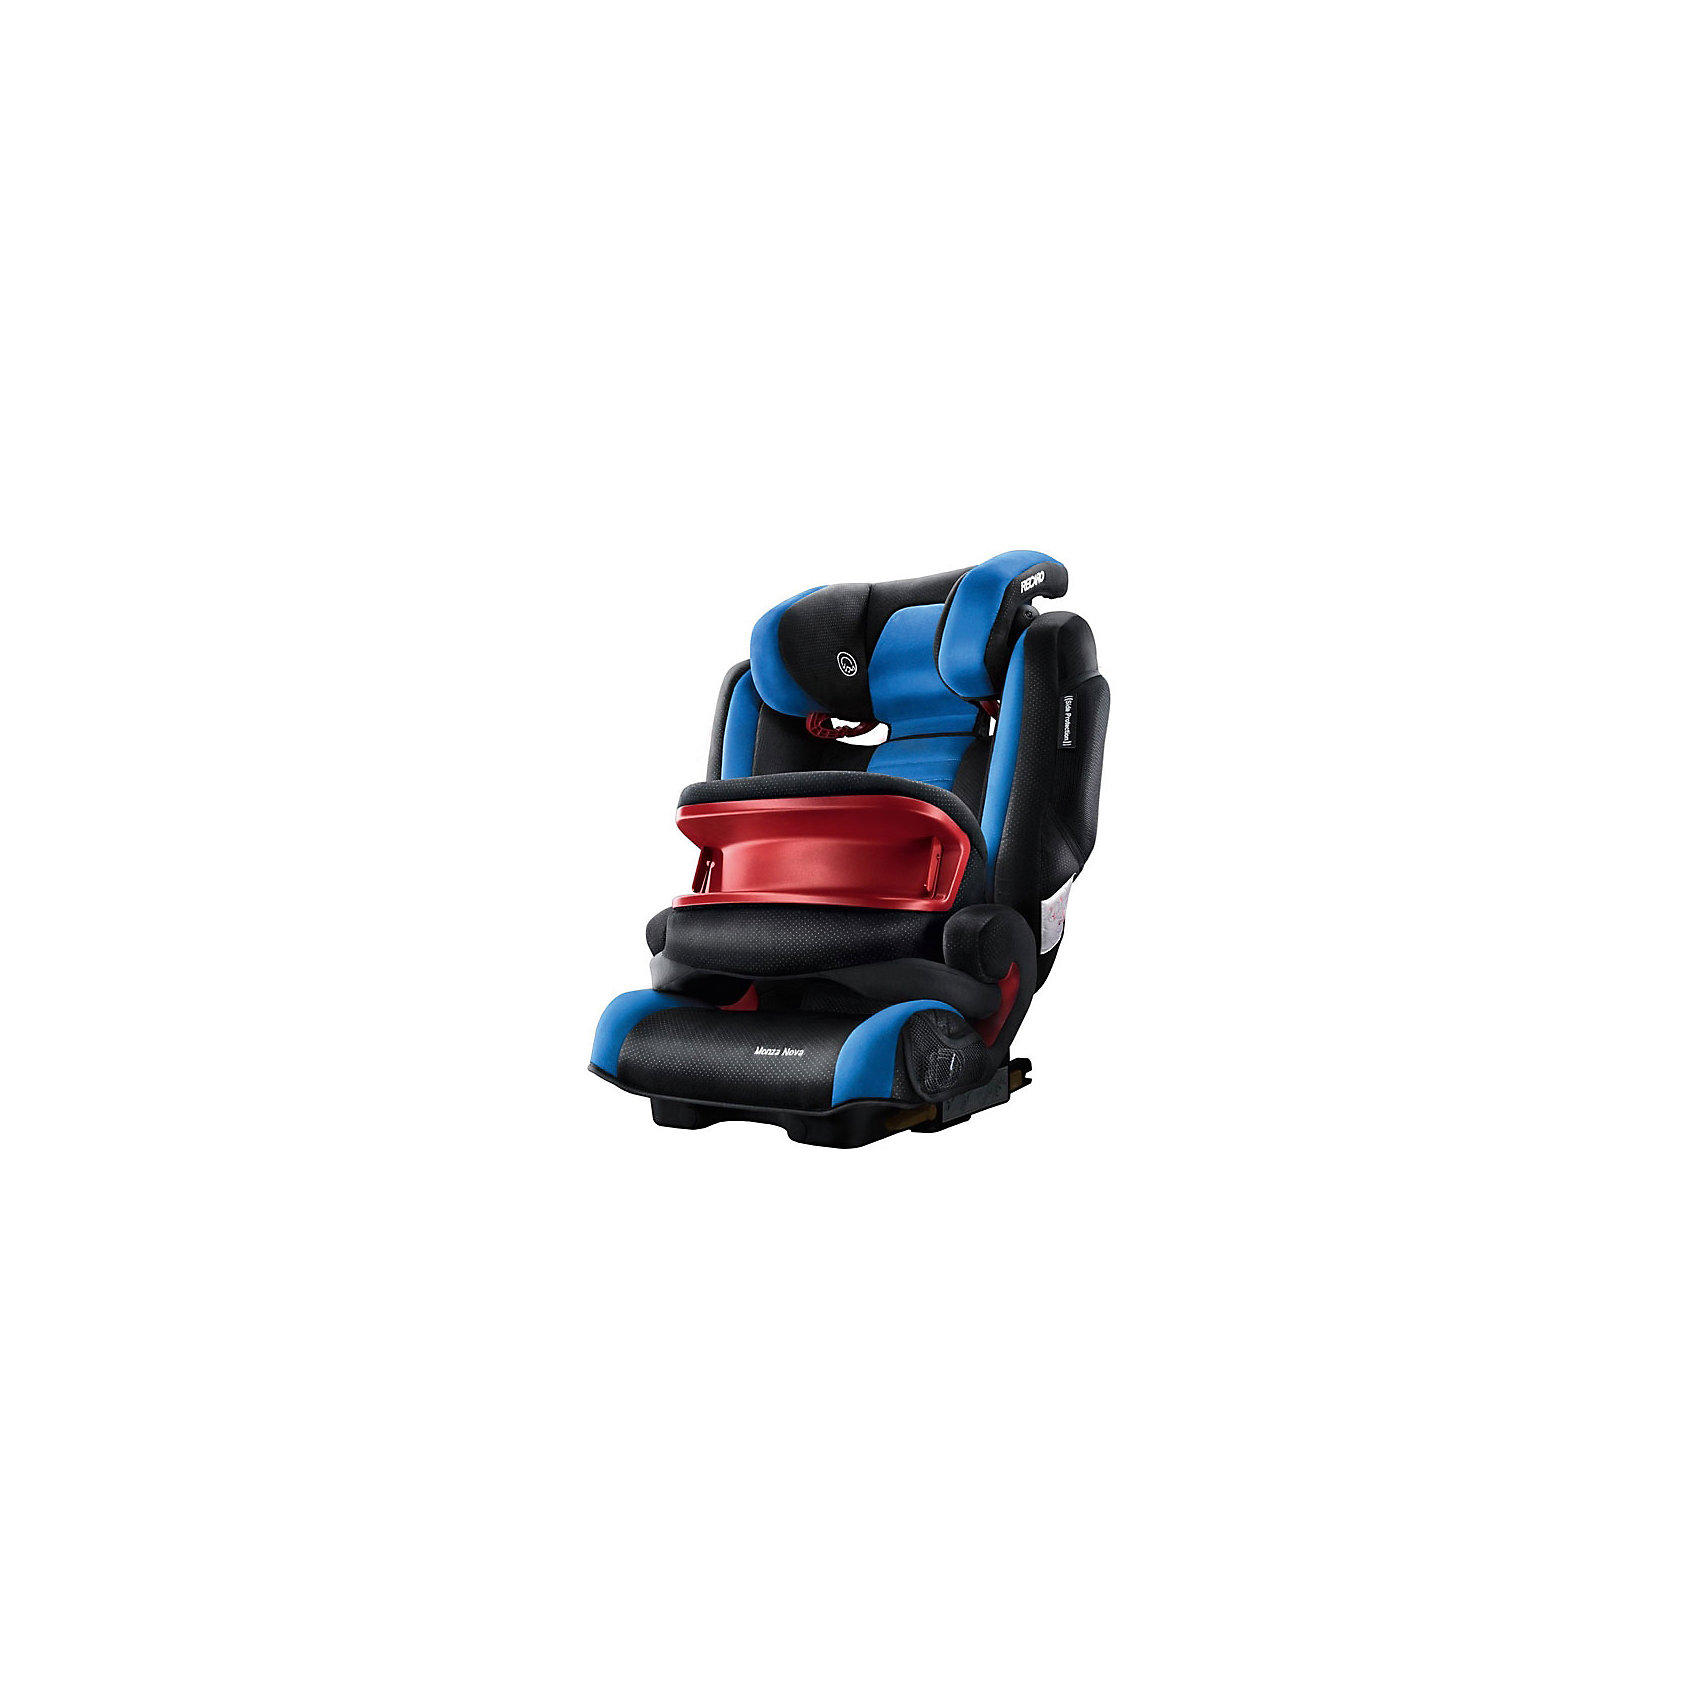 Автокресло RECARO Monza Nova IS SF, 9-36 кг, saphir